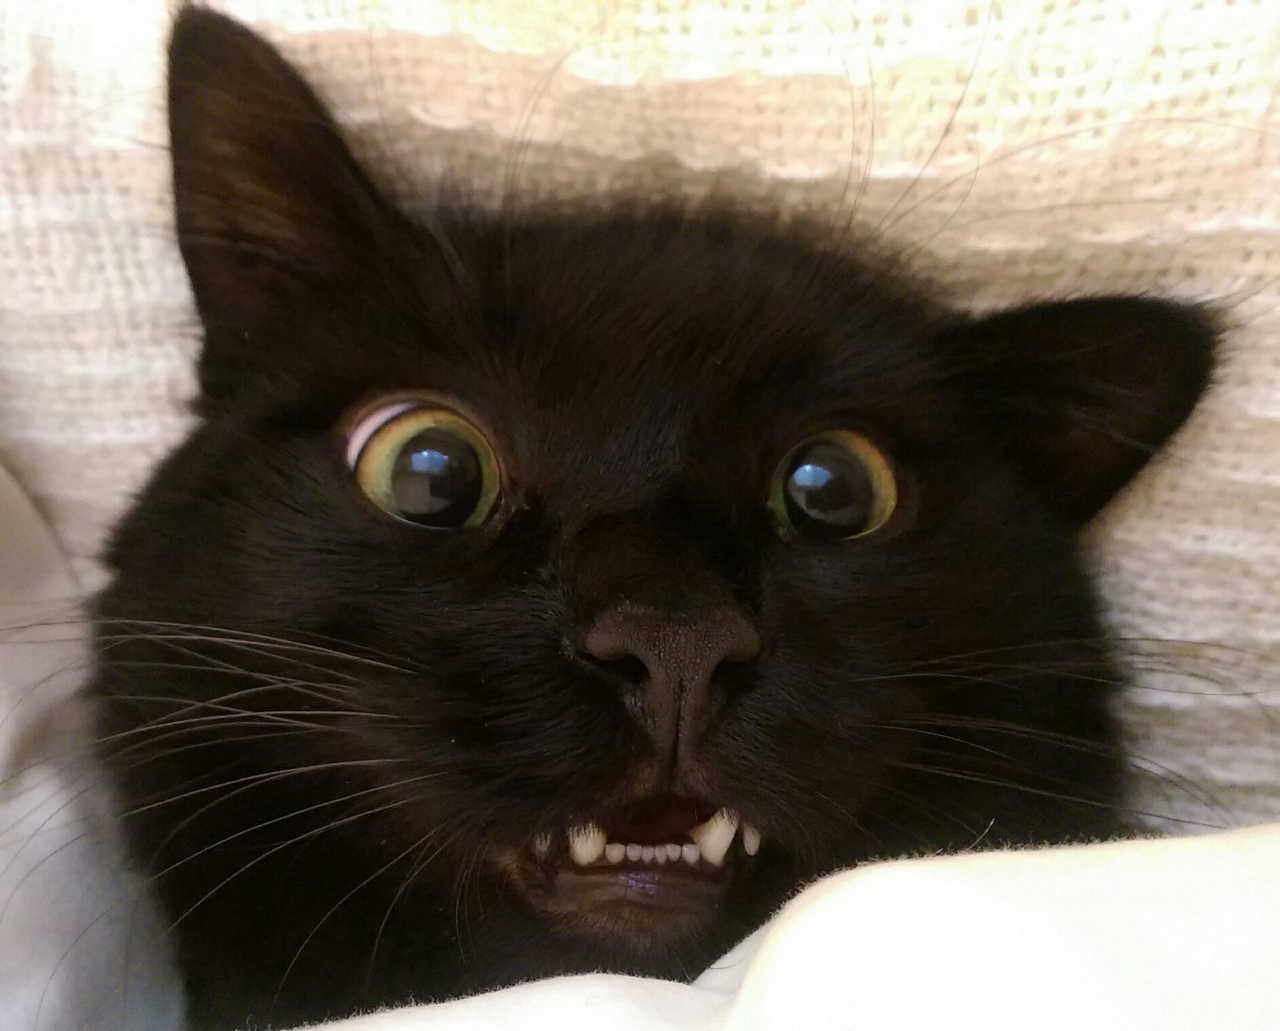 Funny cats - part 157, cat photos, best cat picture